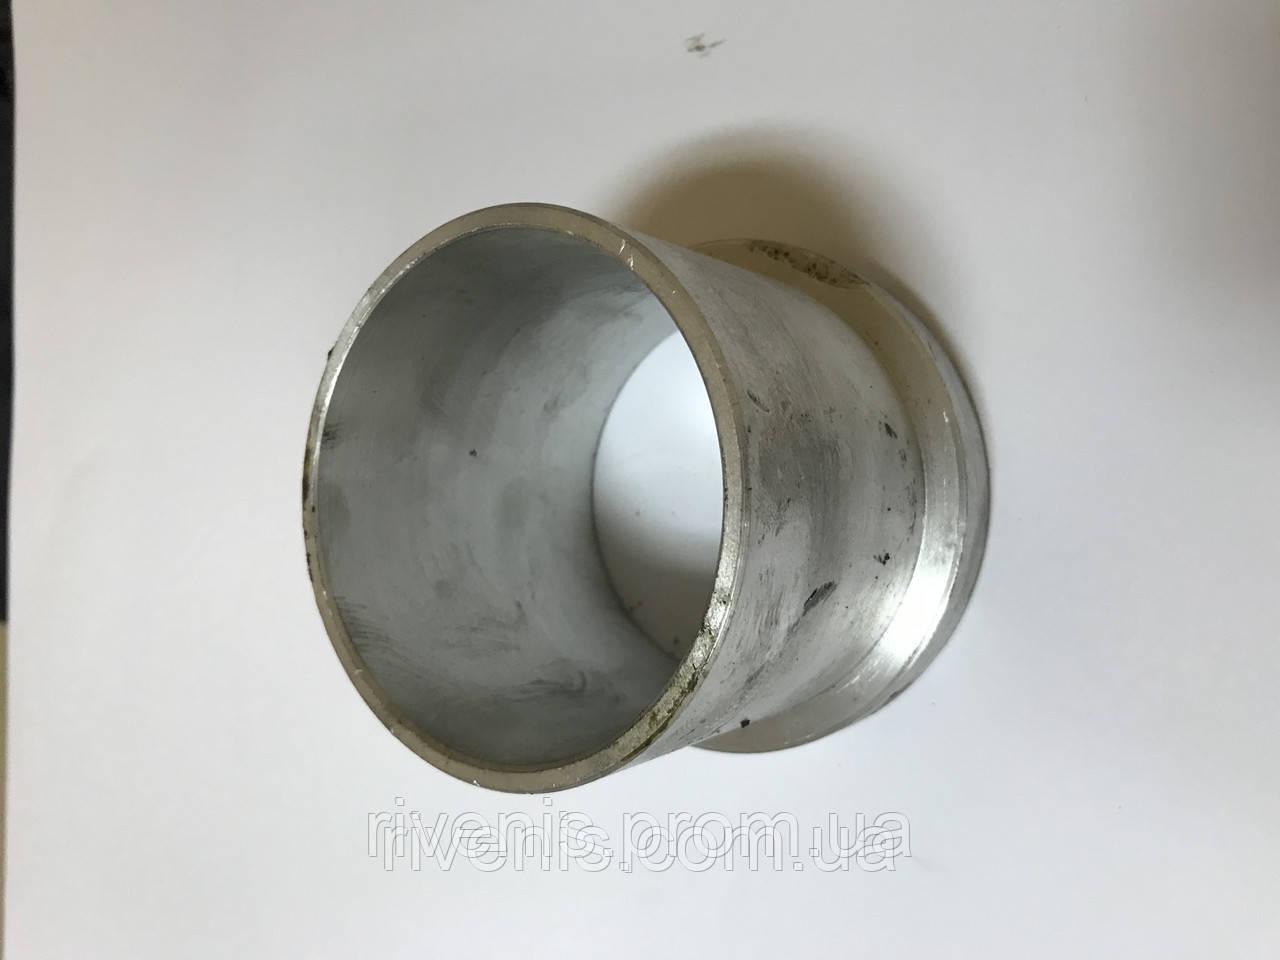 Втулка упорная балансира Урал 375-2918026